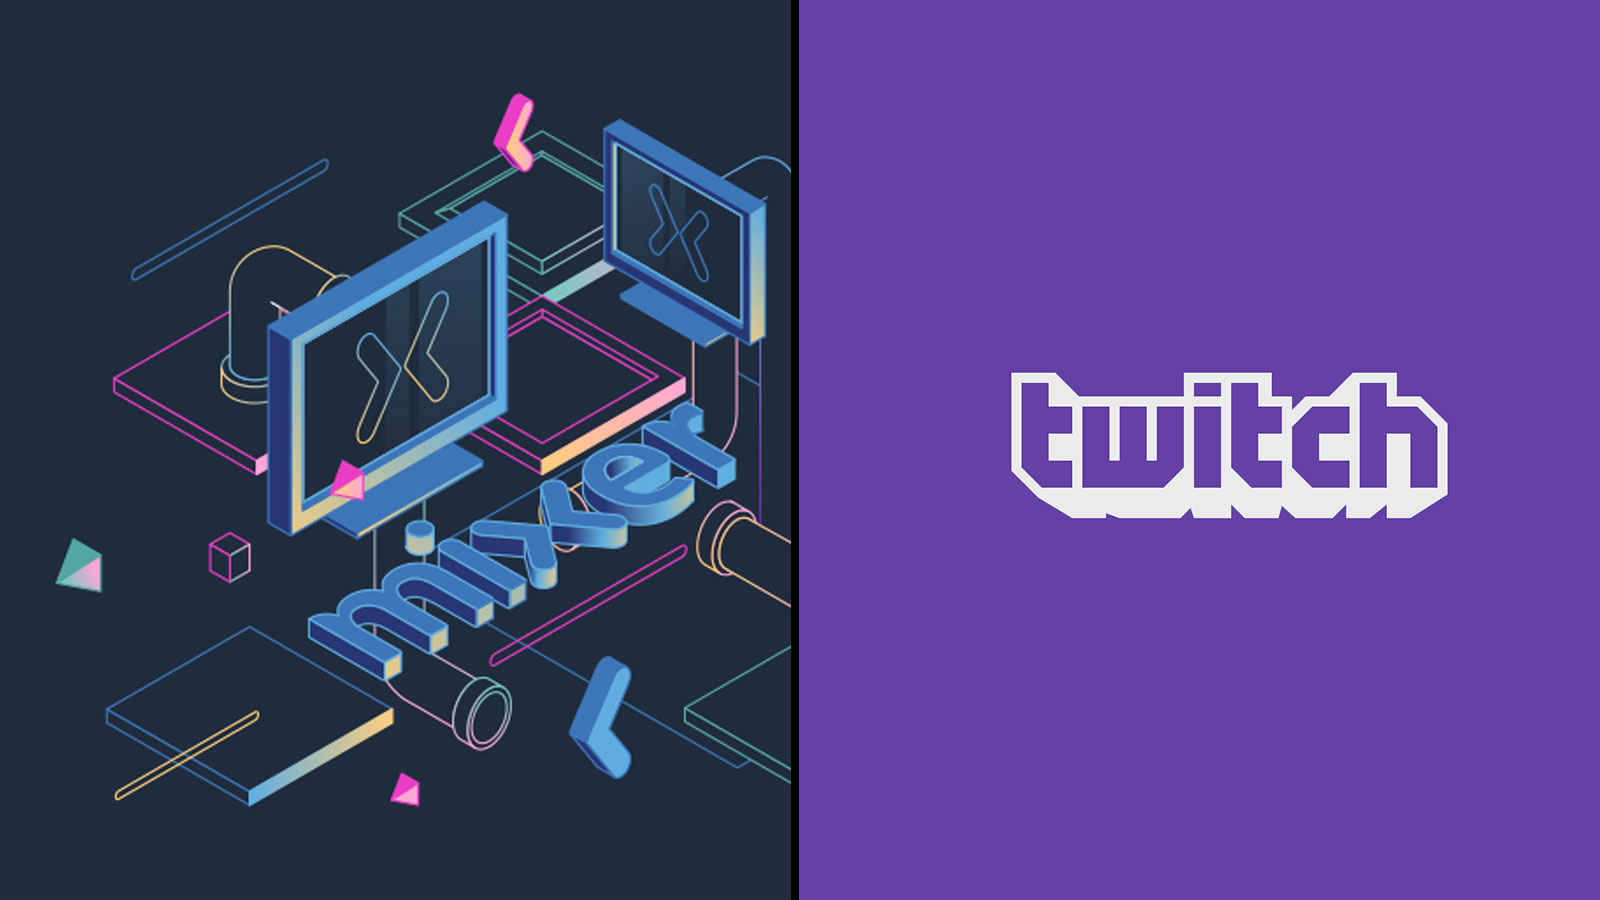 Mixer / Twitch